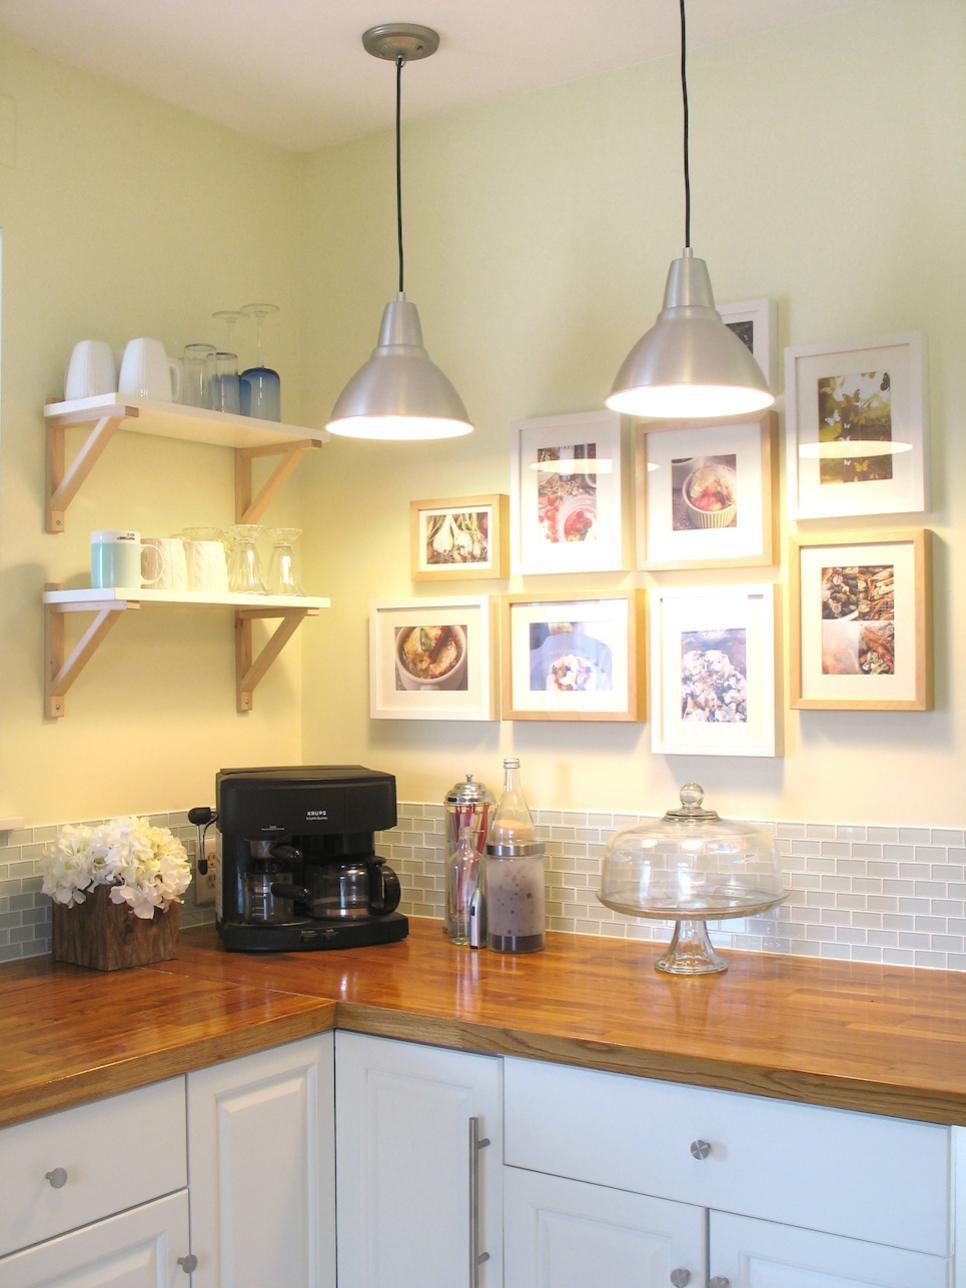 painted kitchen cabinet ideas white photo - 6